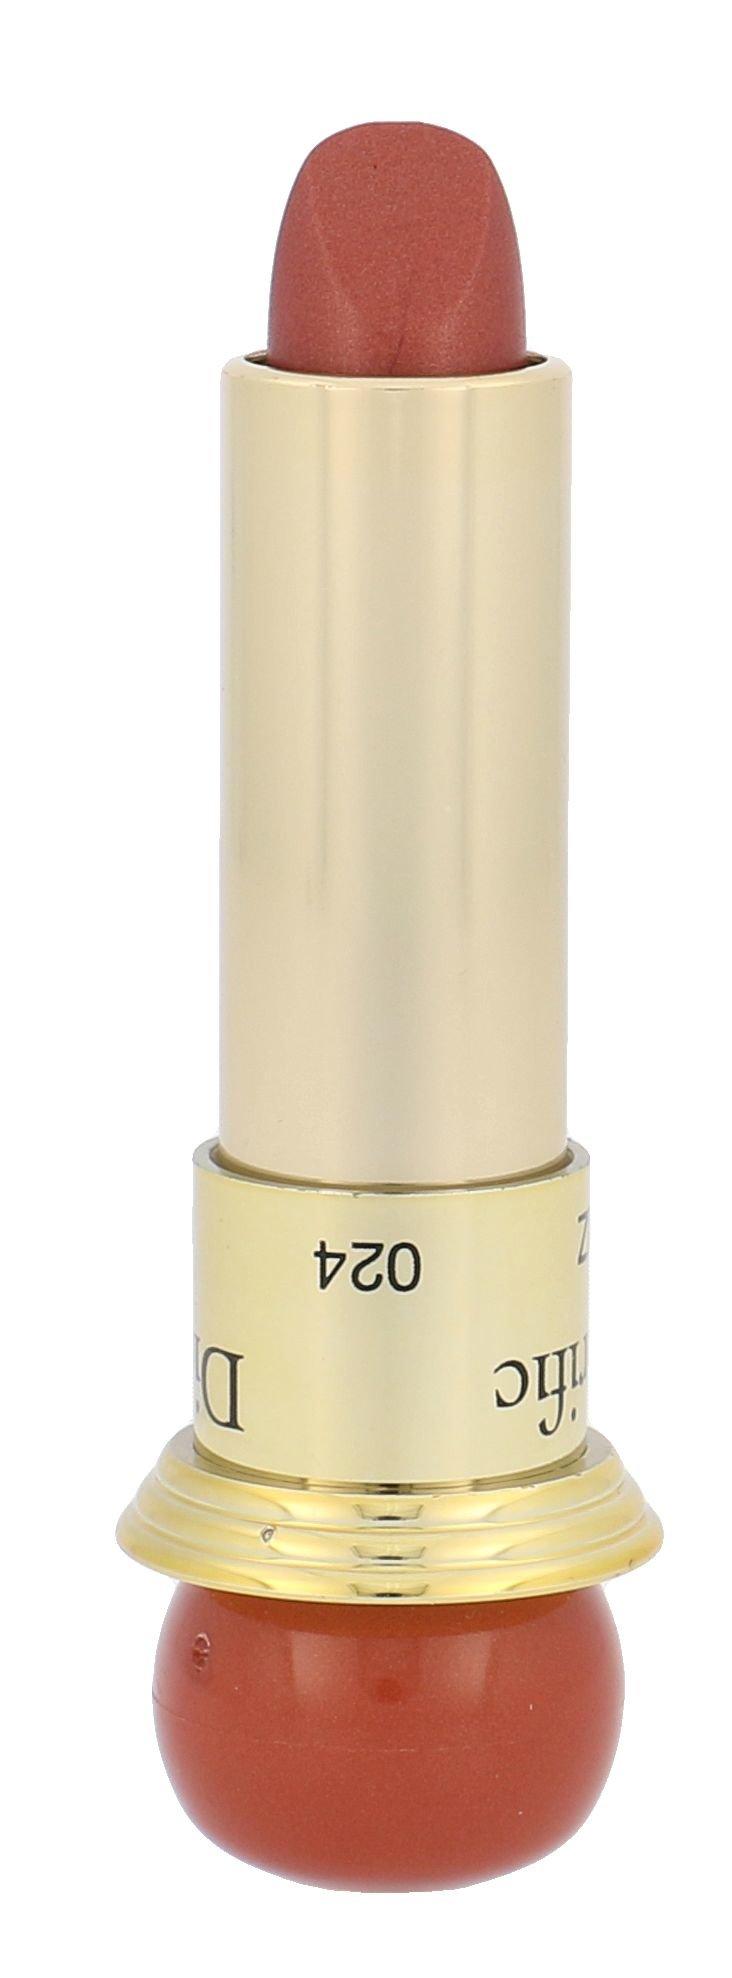 Christian Dior Diorific Cosmetic 3,5ml 024 Liz